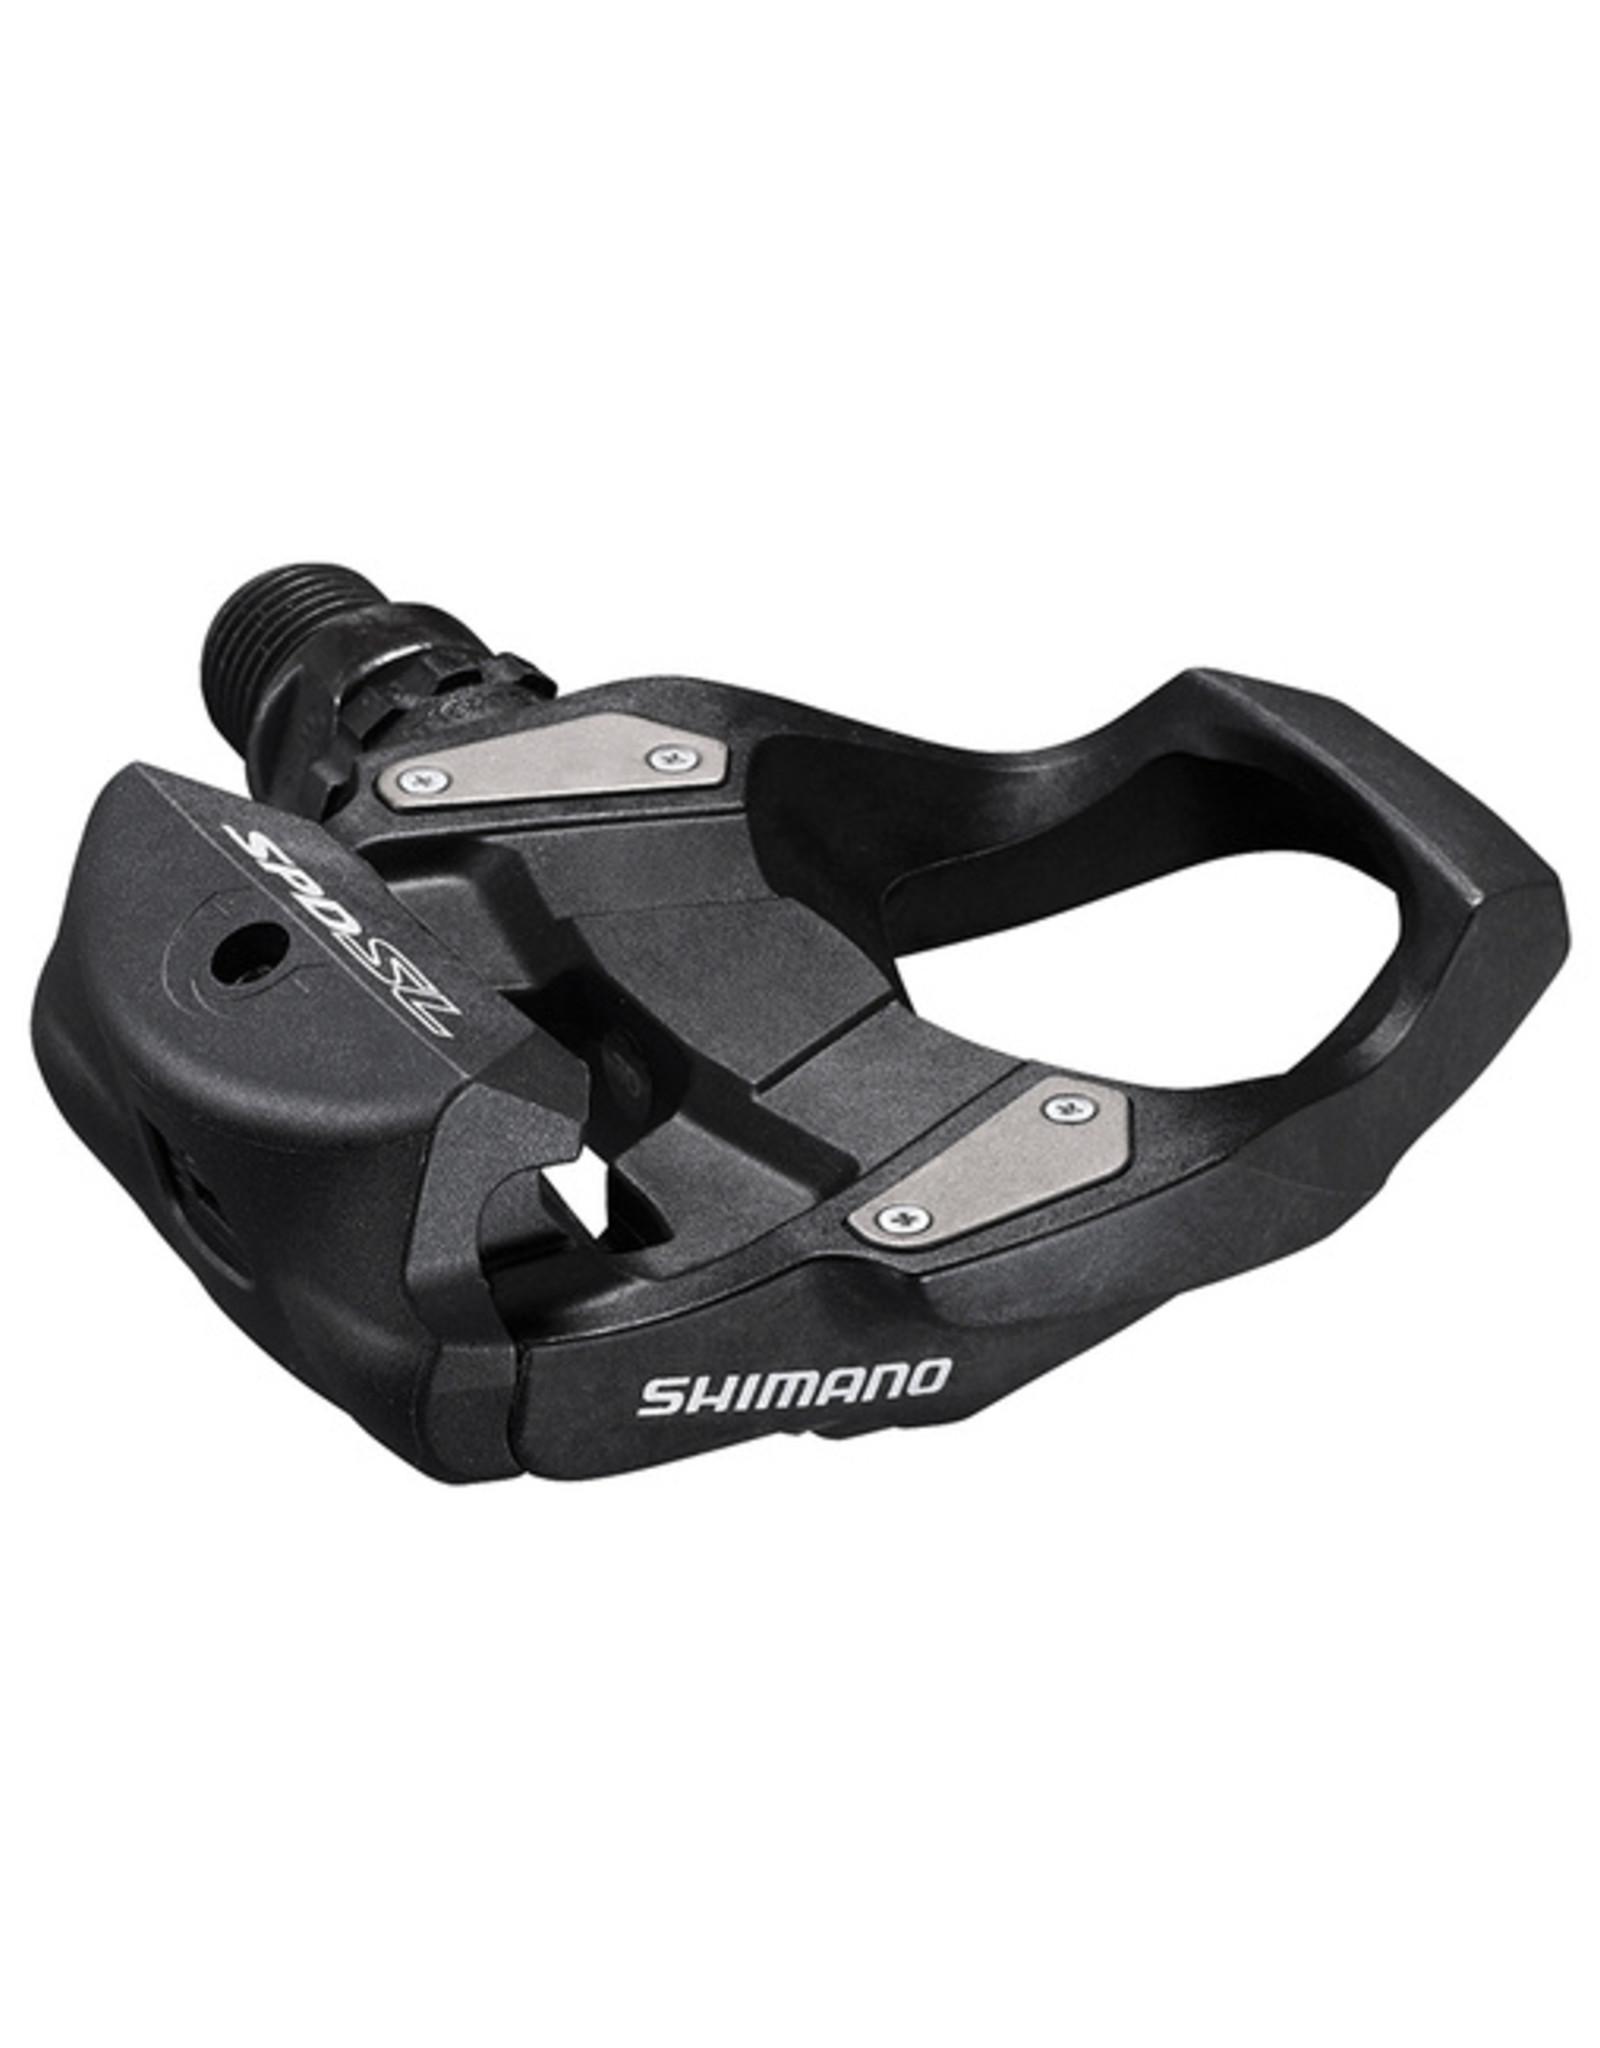 SHIMANO Shimano PD-RS500 Black Light Action SPD-SL